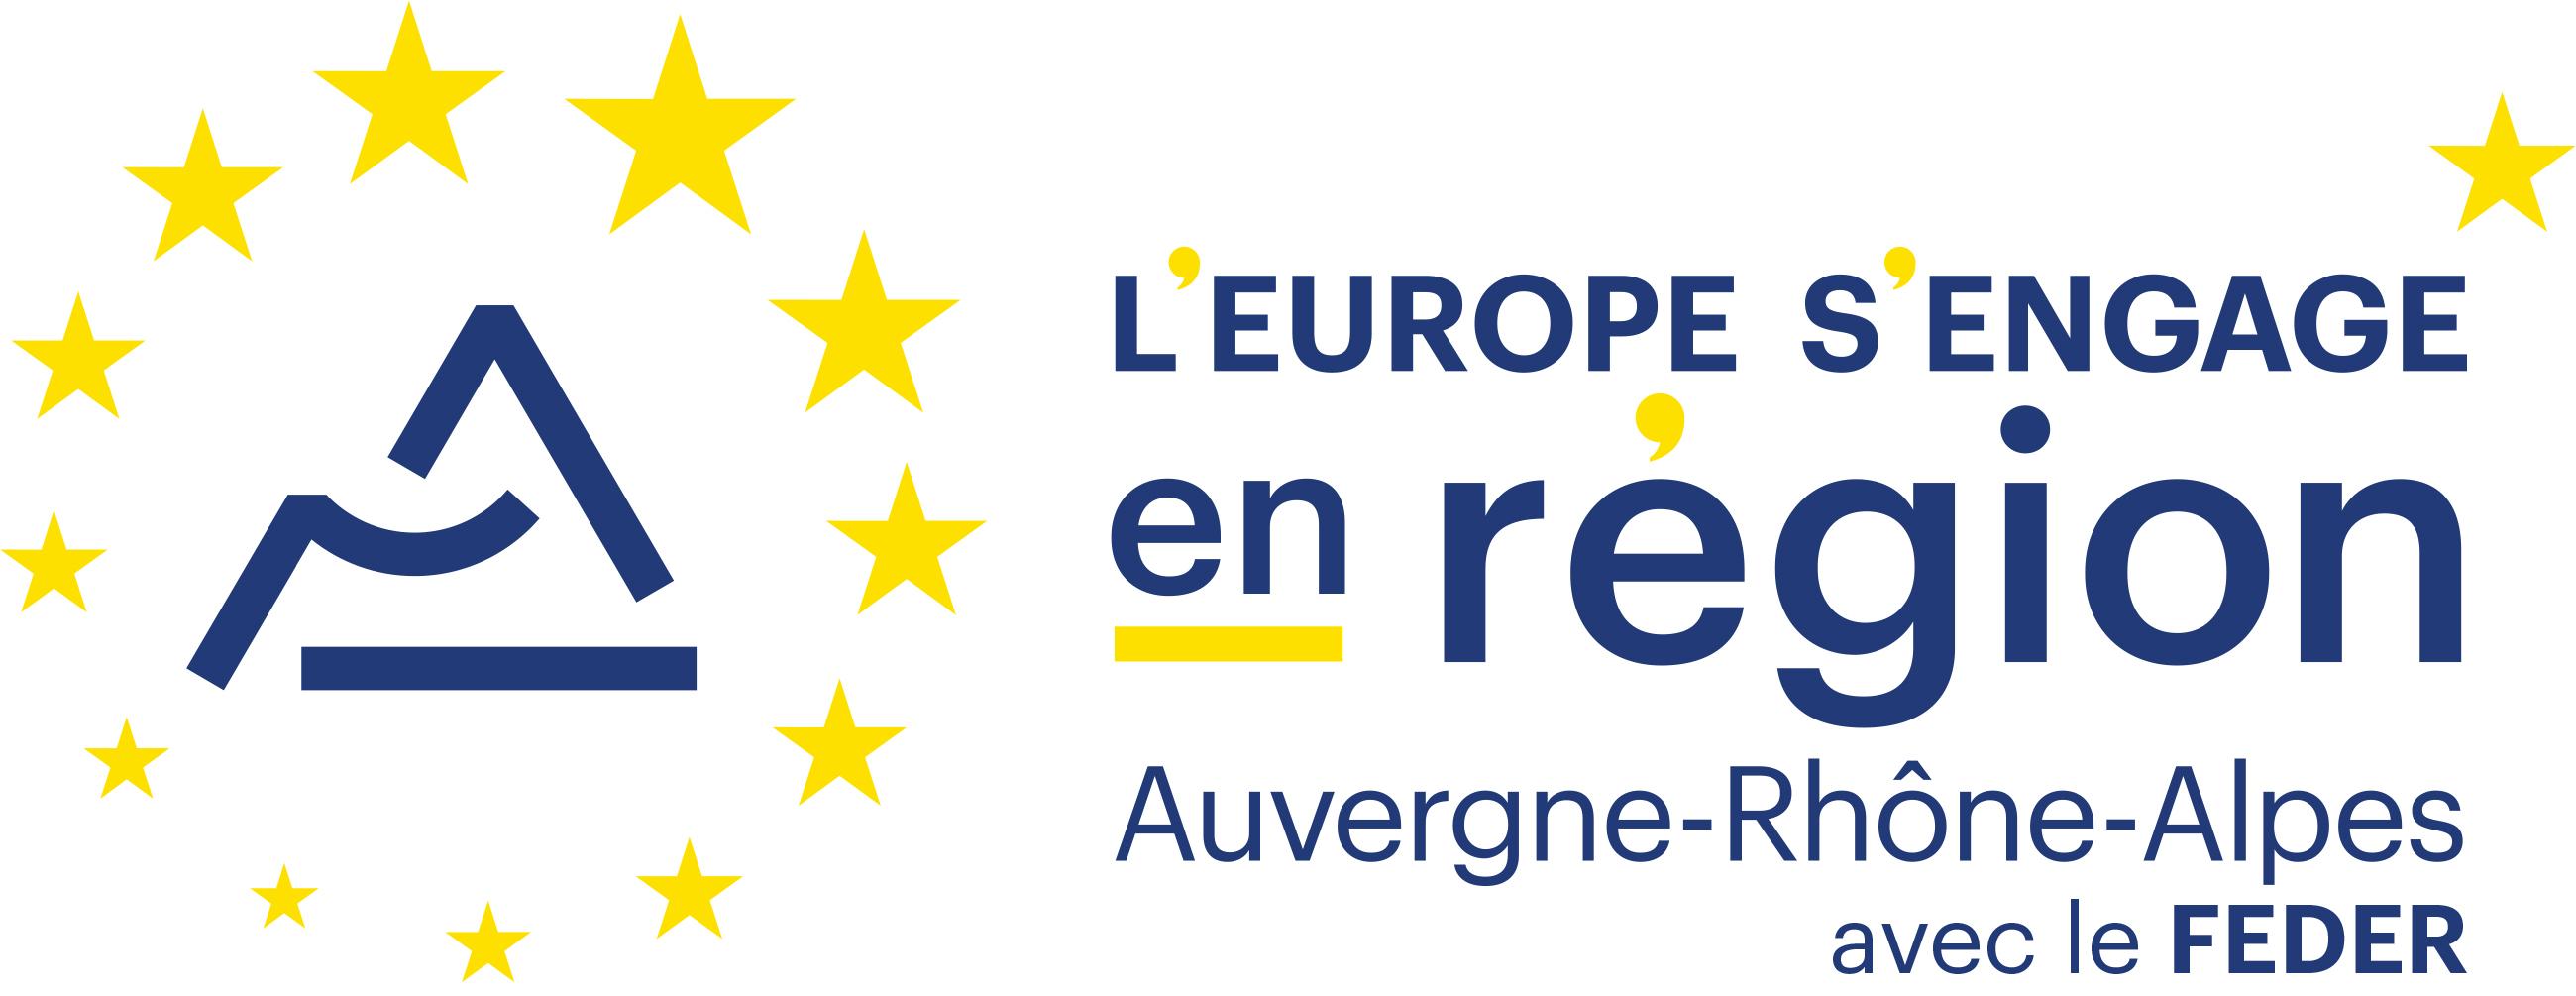 Logo_LEurope_sengage_FEDER_2017_Quadri.jpg